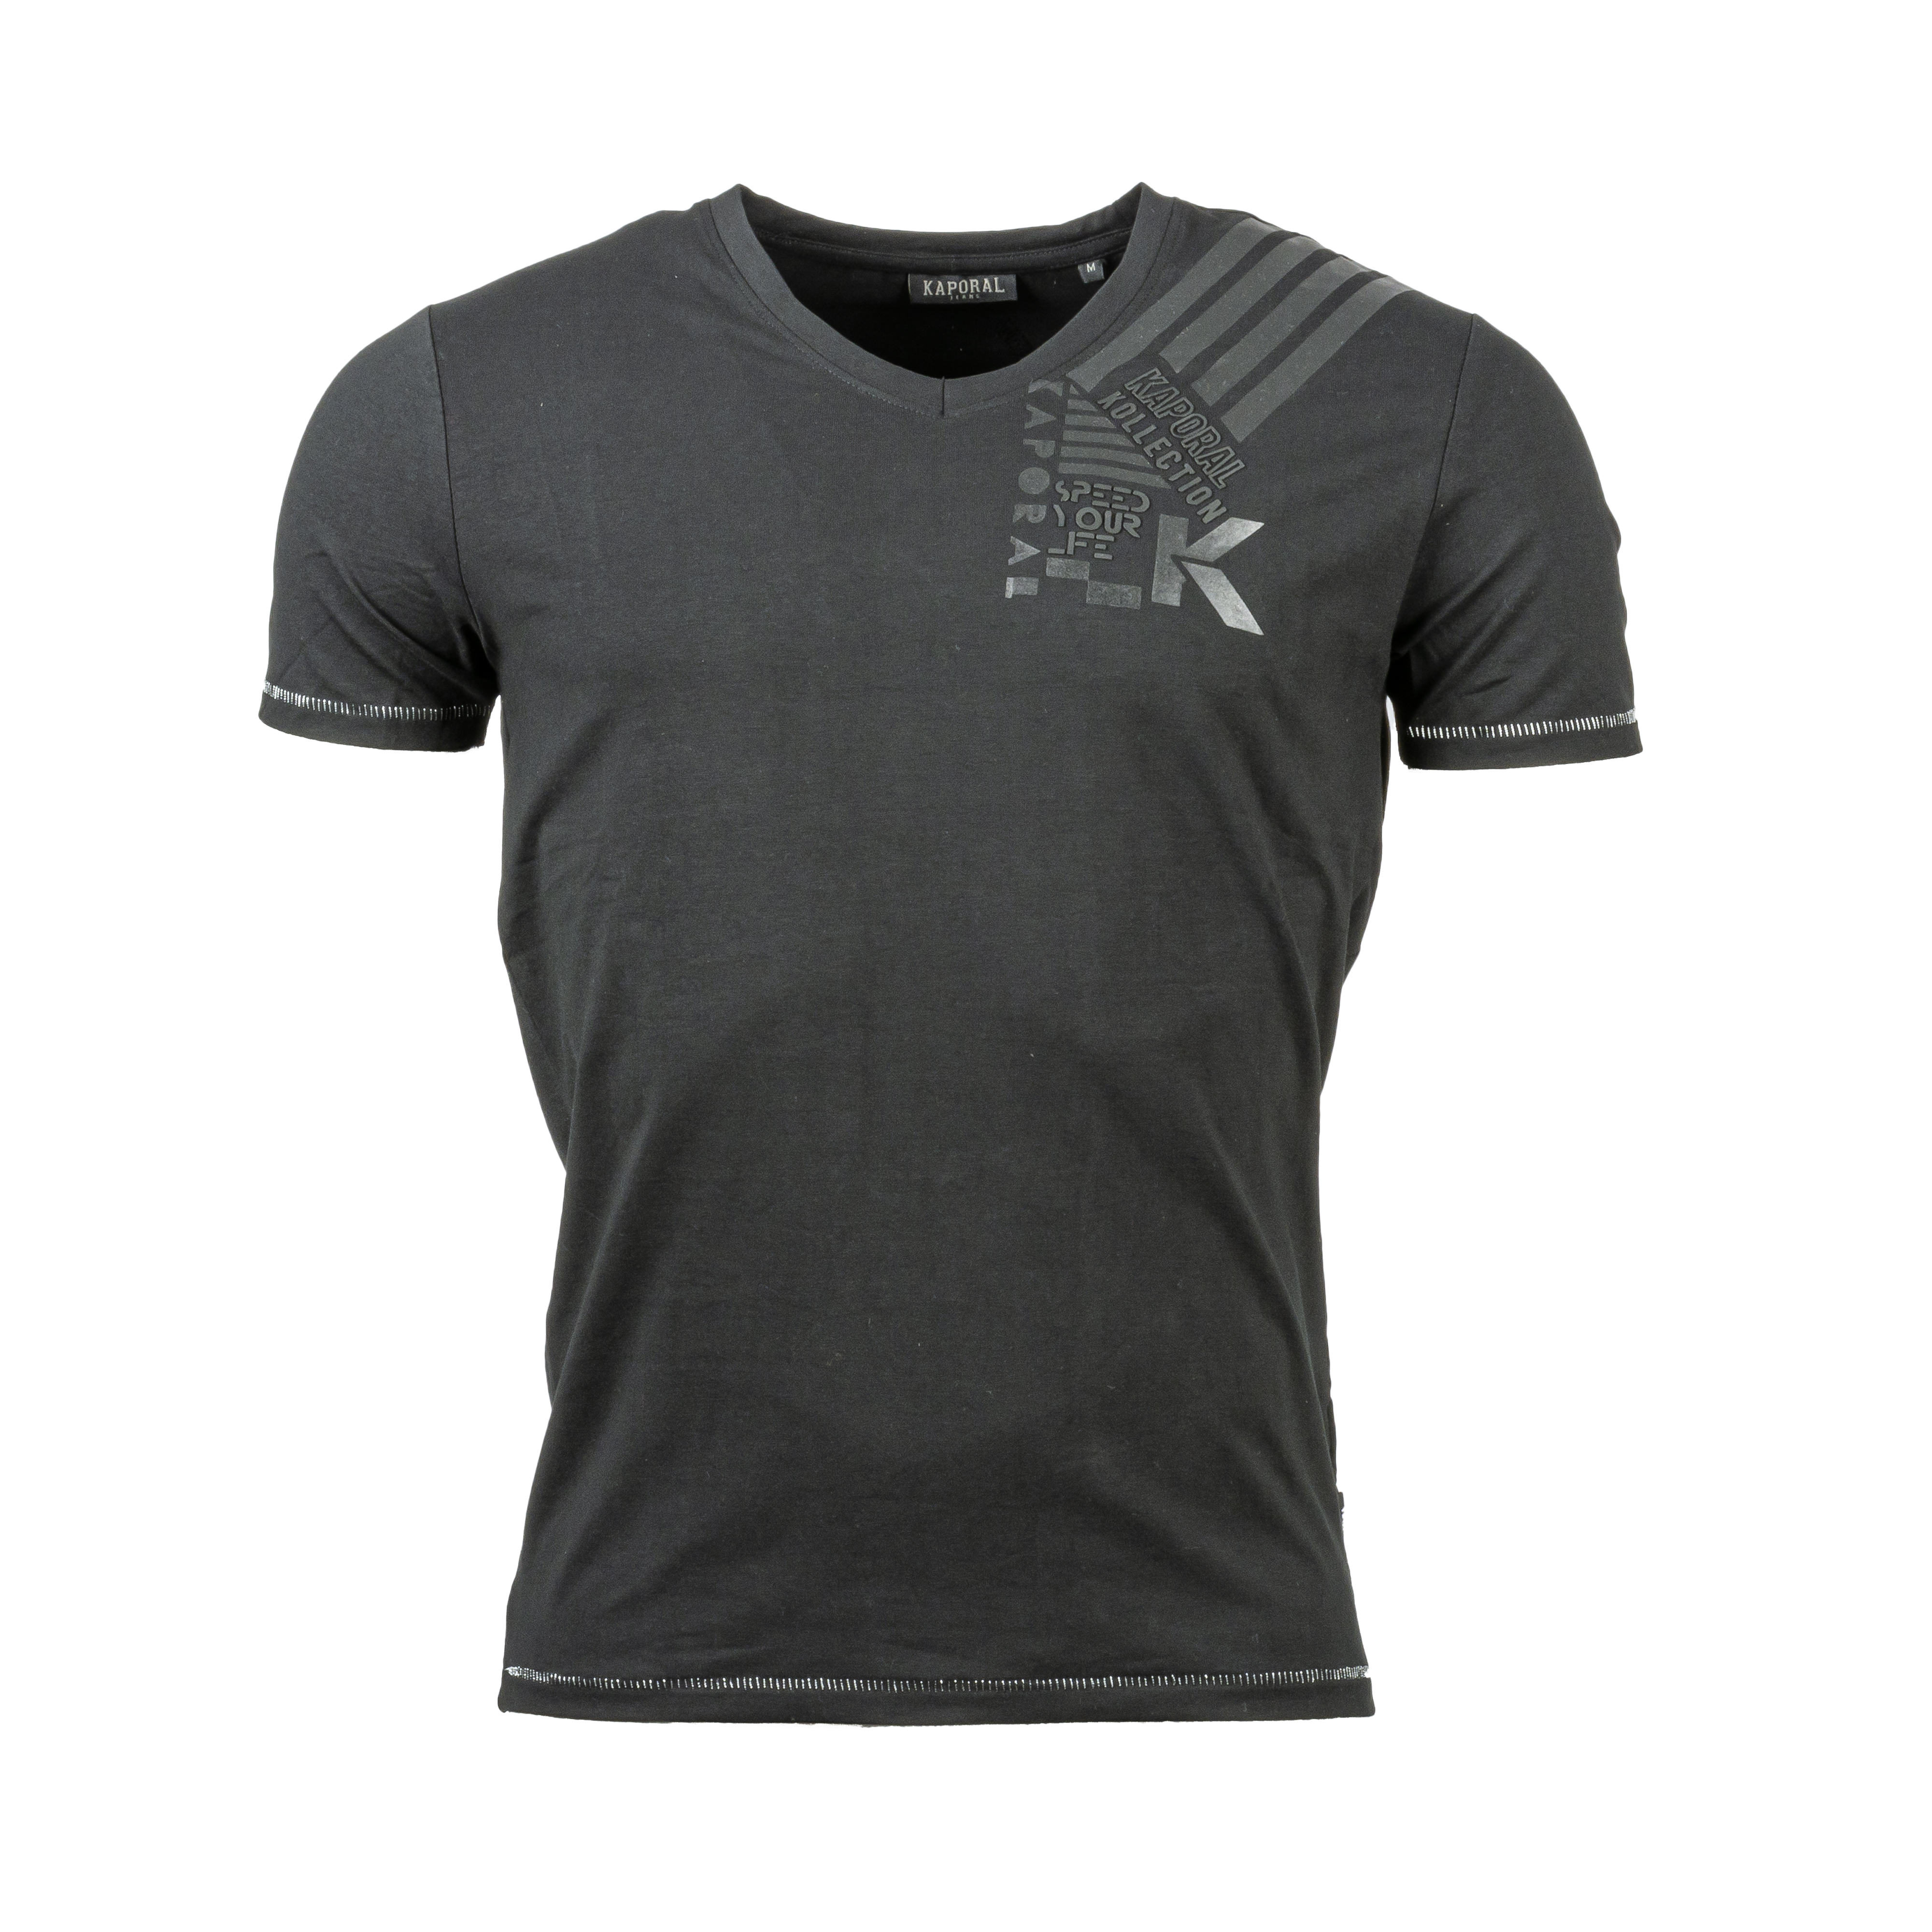 Tee-shirt col v  muira en coton stretch noir floqué